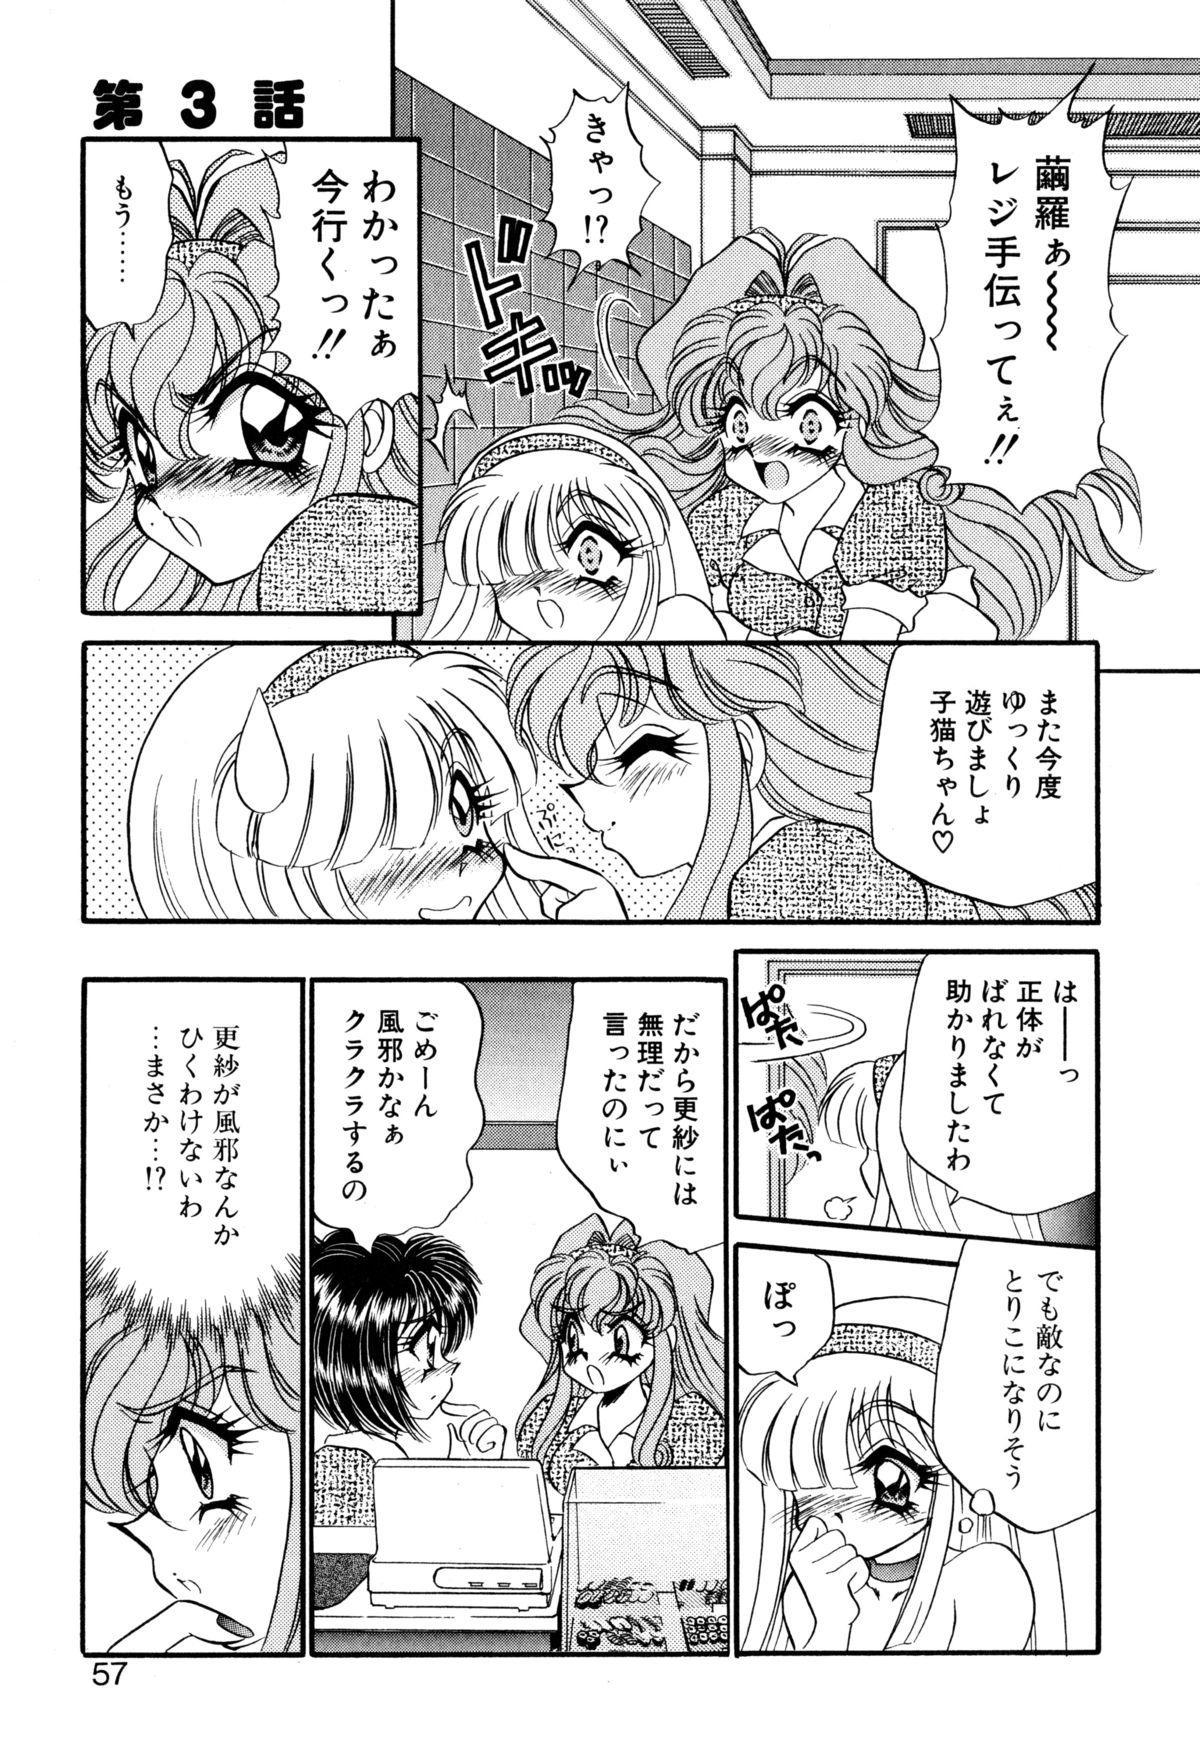 Kigurumi Sentai Quiltian 55